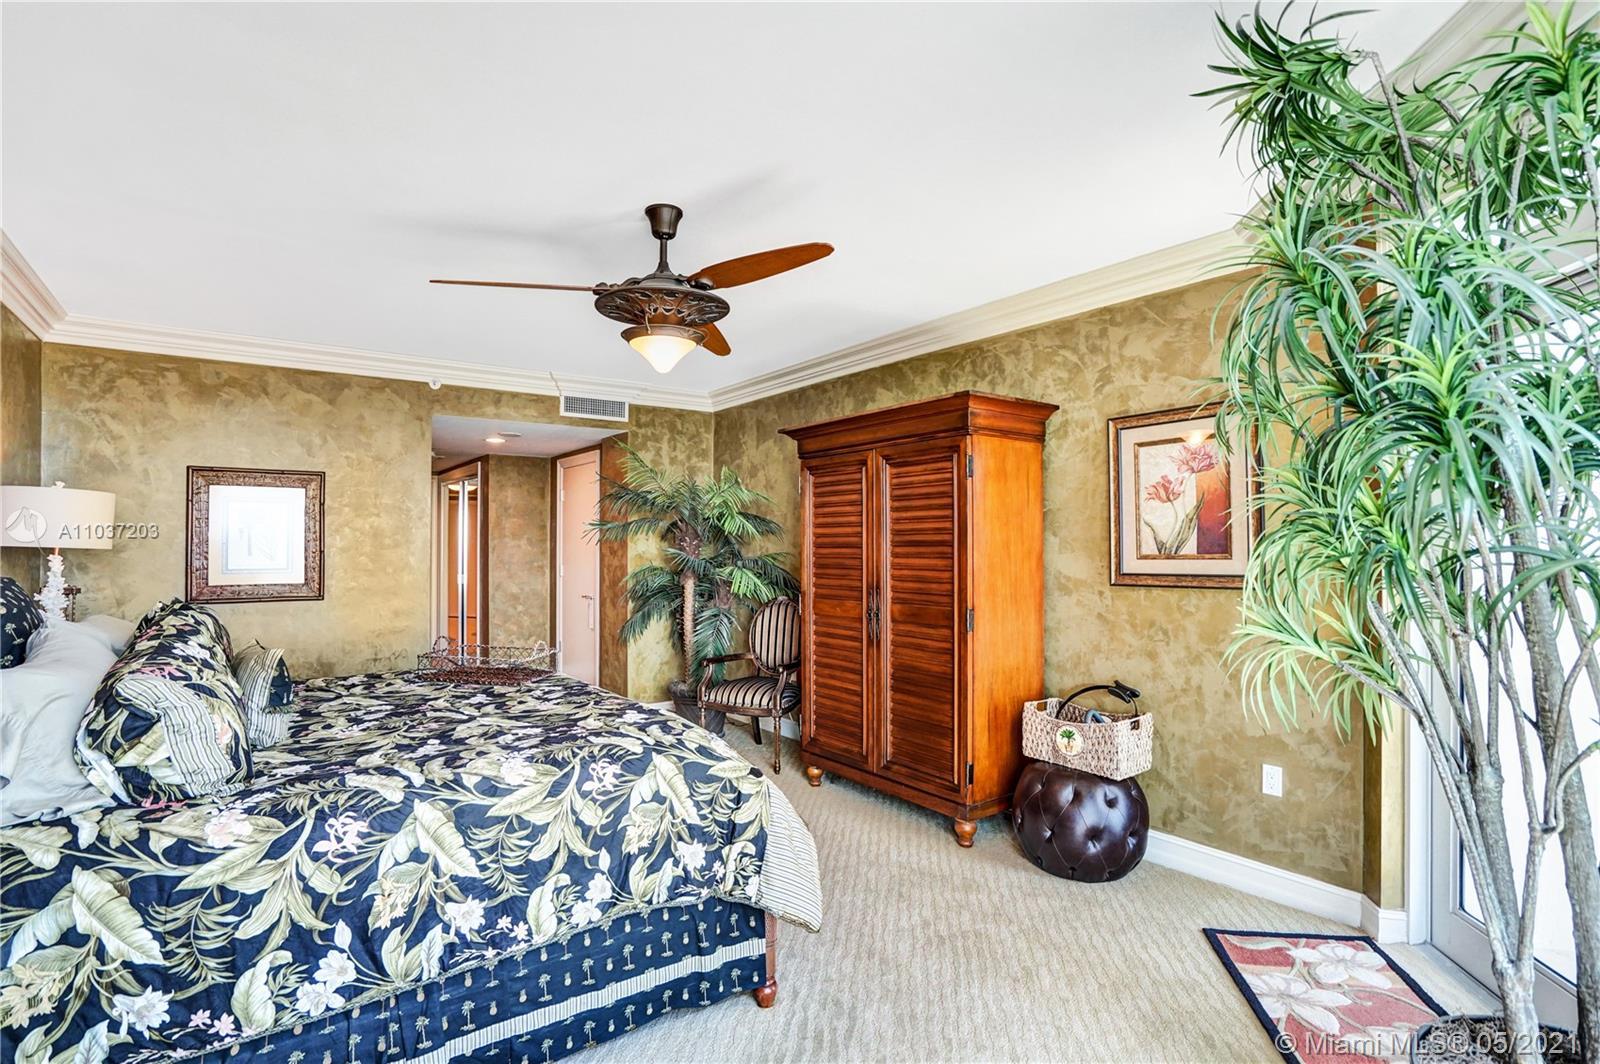 Photo of 20201 Country Club Dr #1006, Aventura, Florida, 33180 - Guest bathroom.